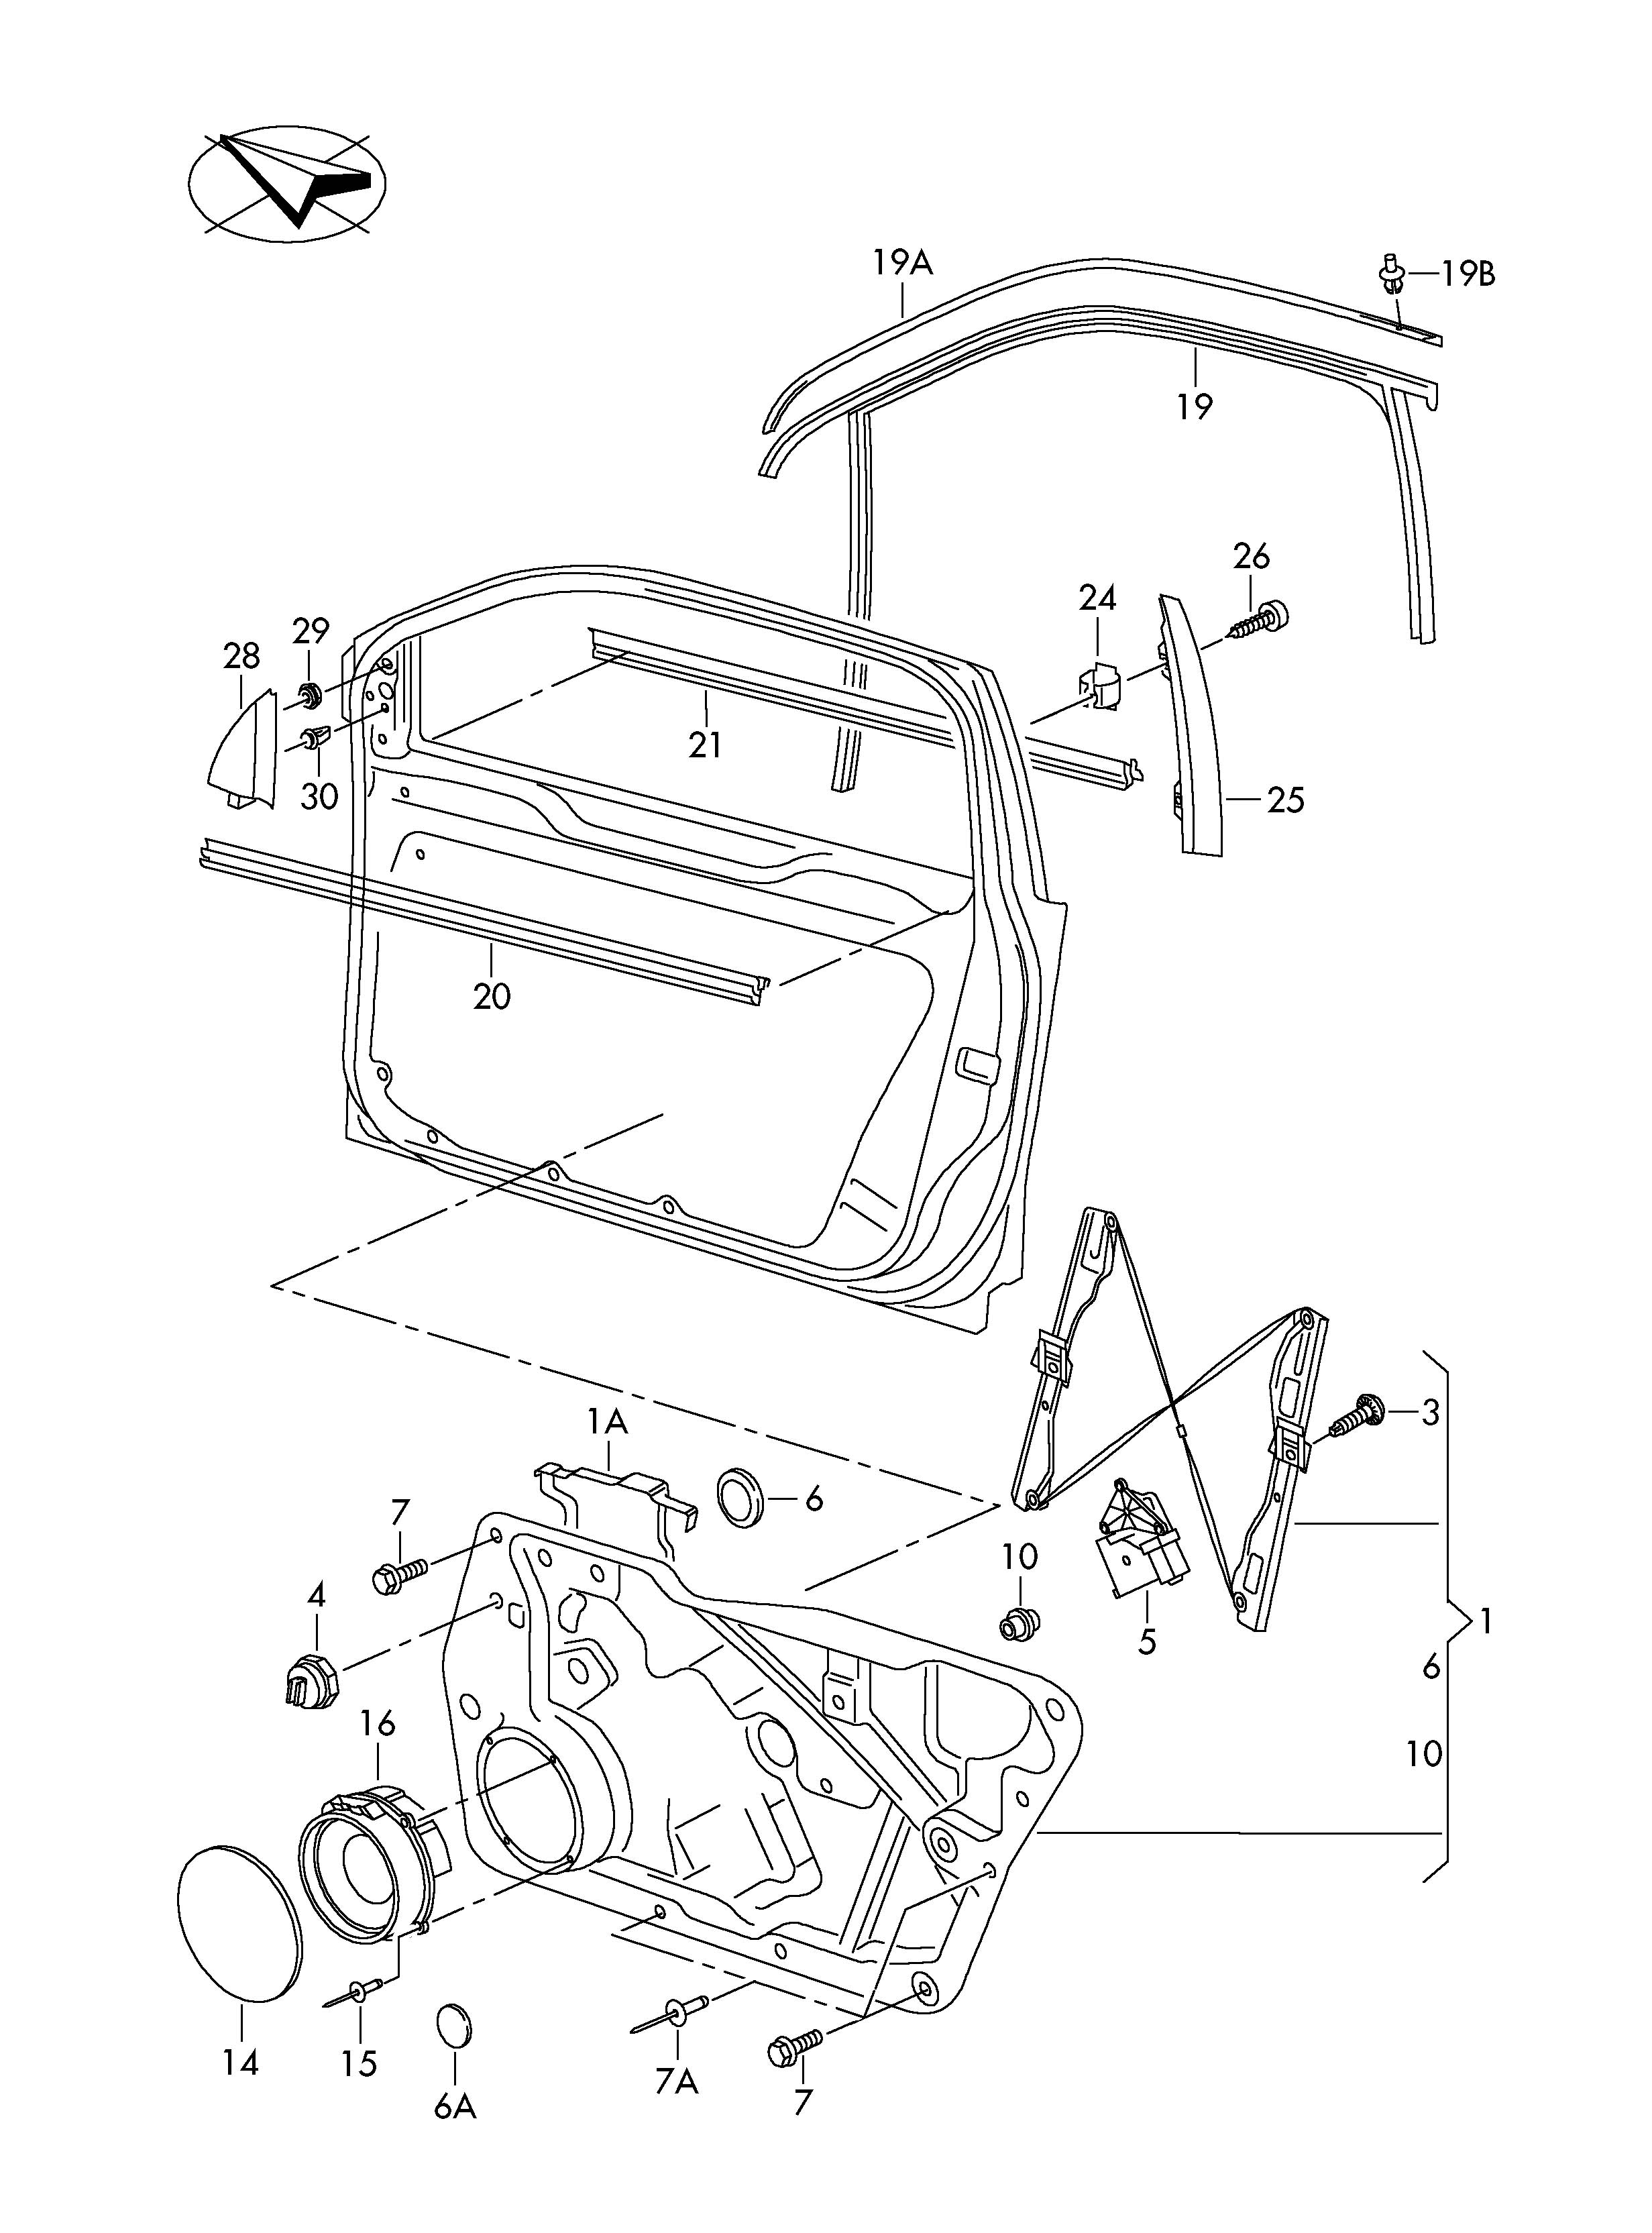 Volkswagen Tiguan Plug F Hole Sheet Metal Thickness